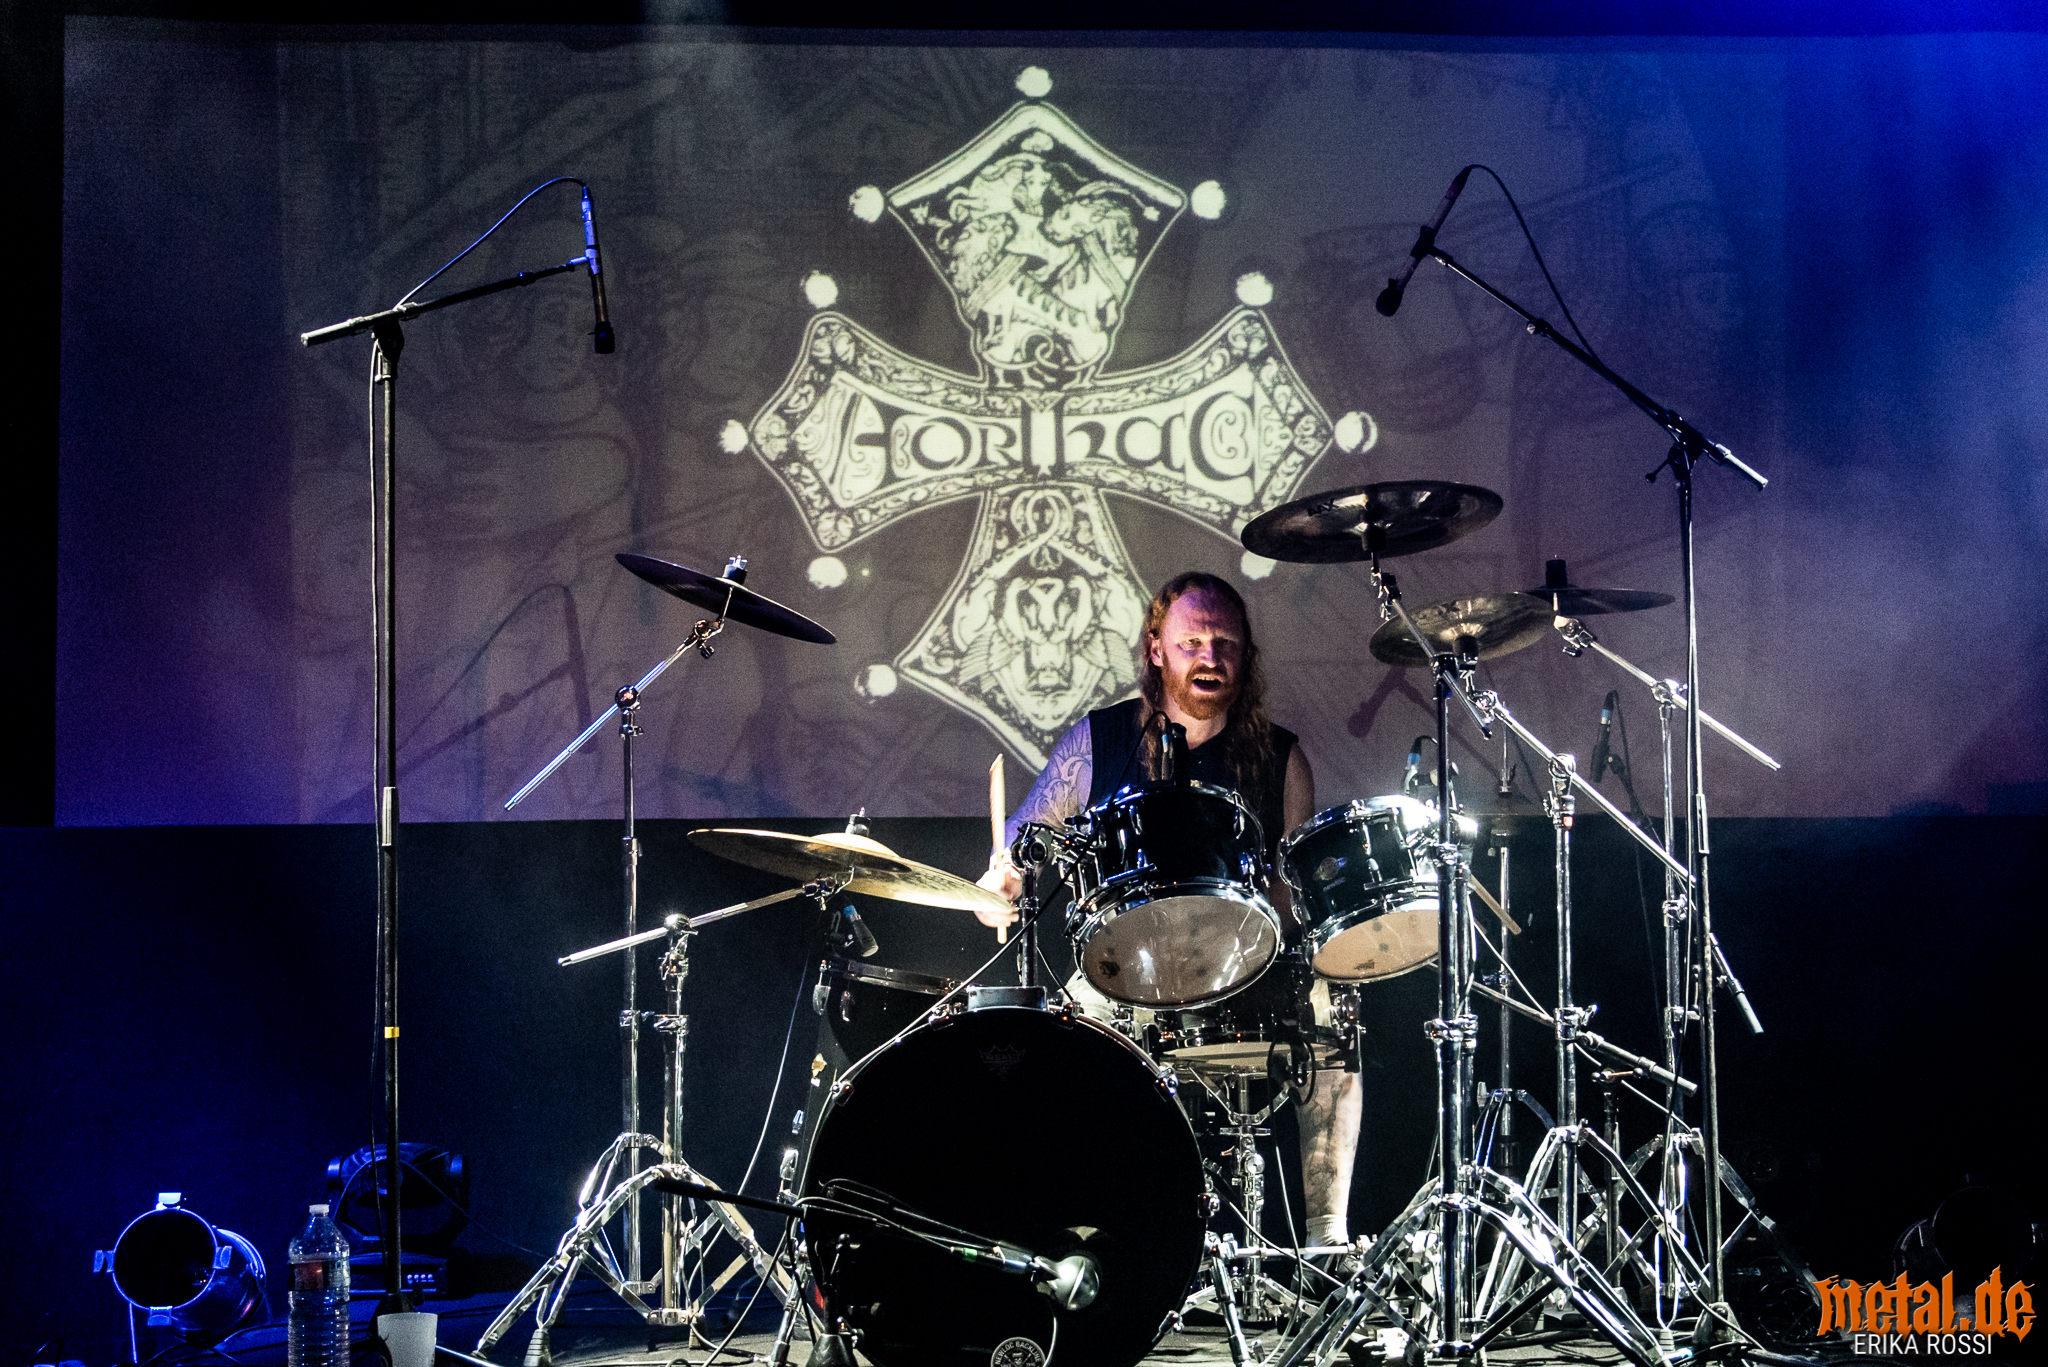 Aorlhac - Ladlo Fest